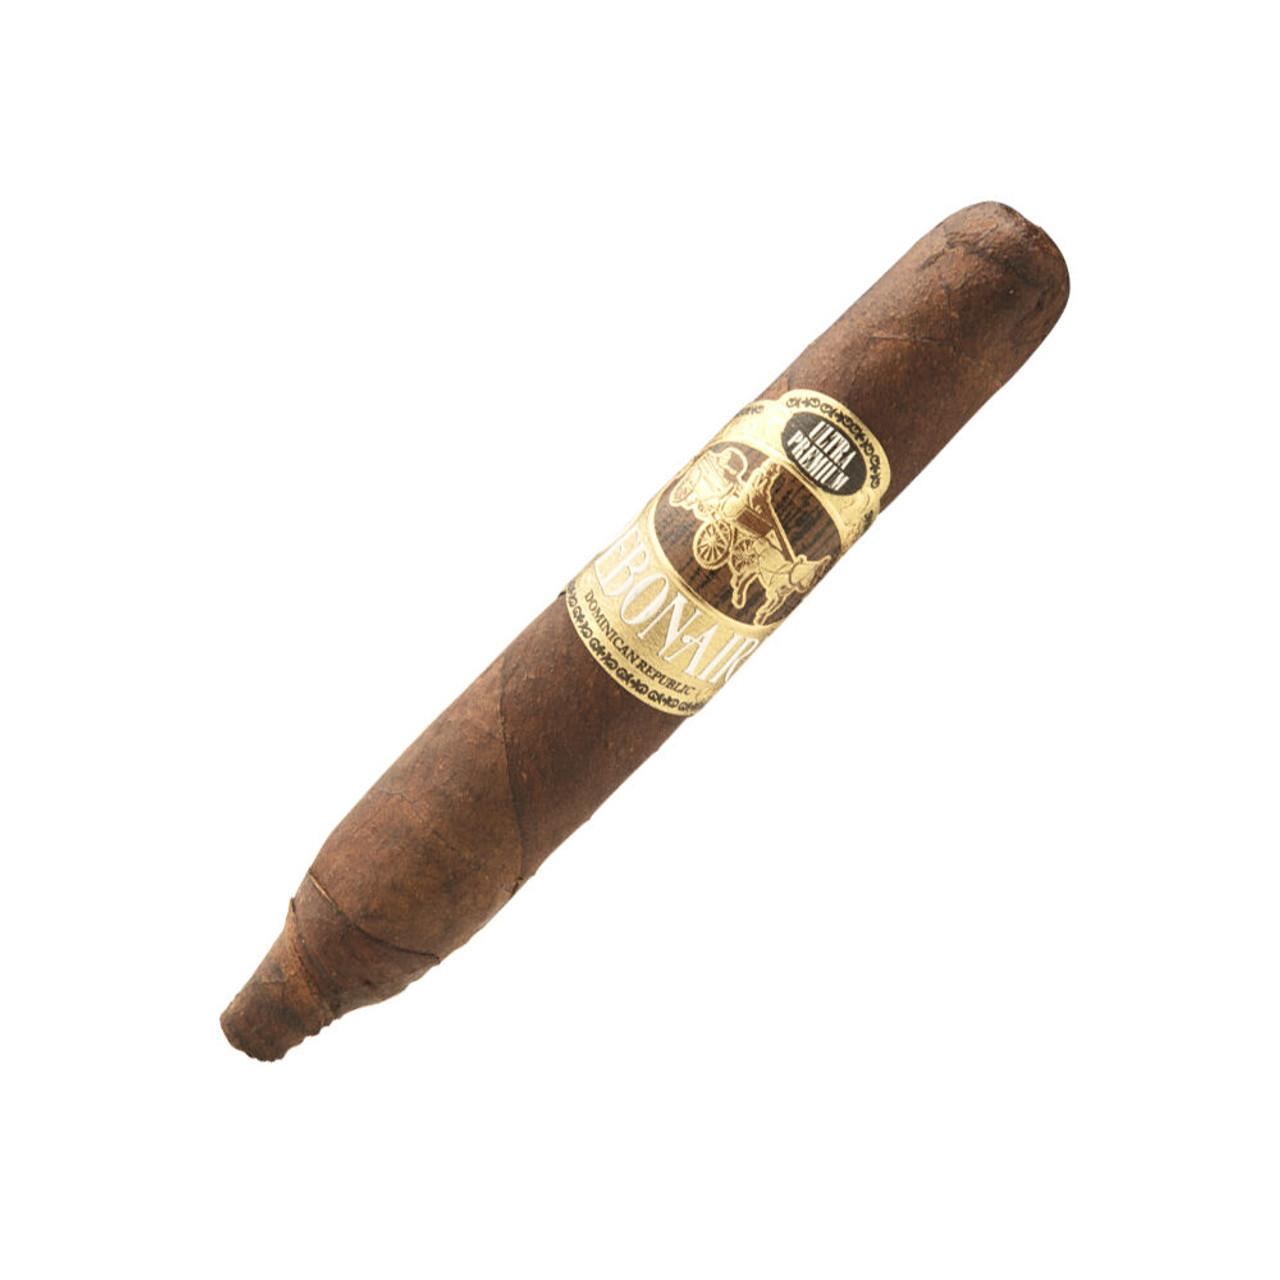 Debonaire Maduro First Degree Cigars - 4 x 44 (Box of 20)